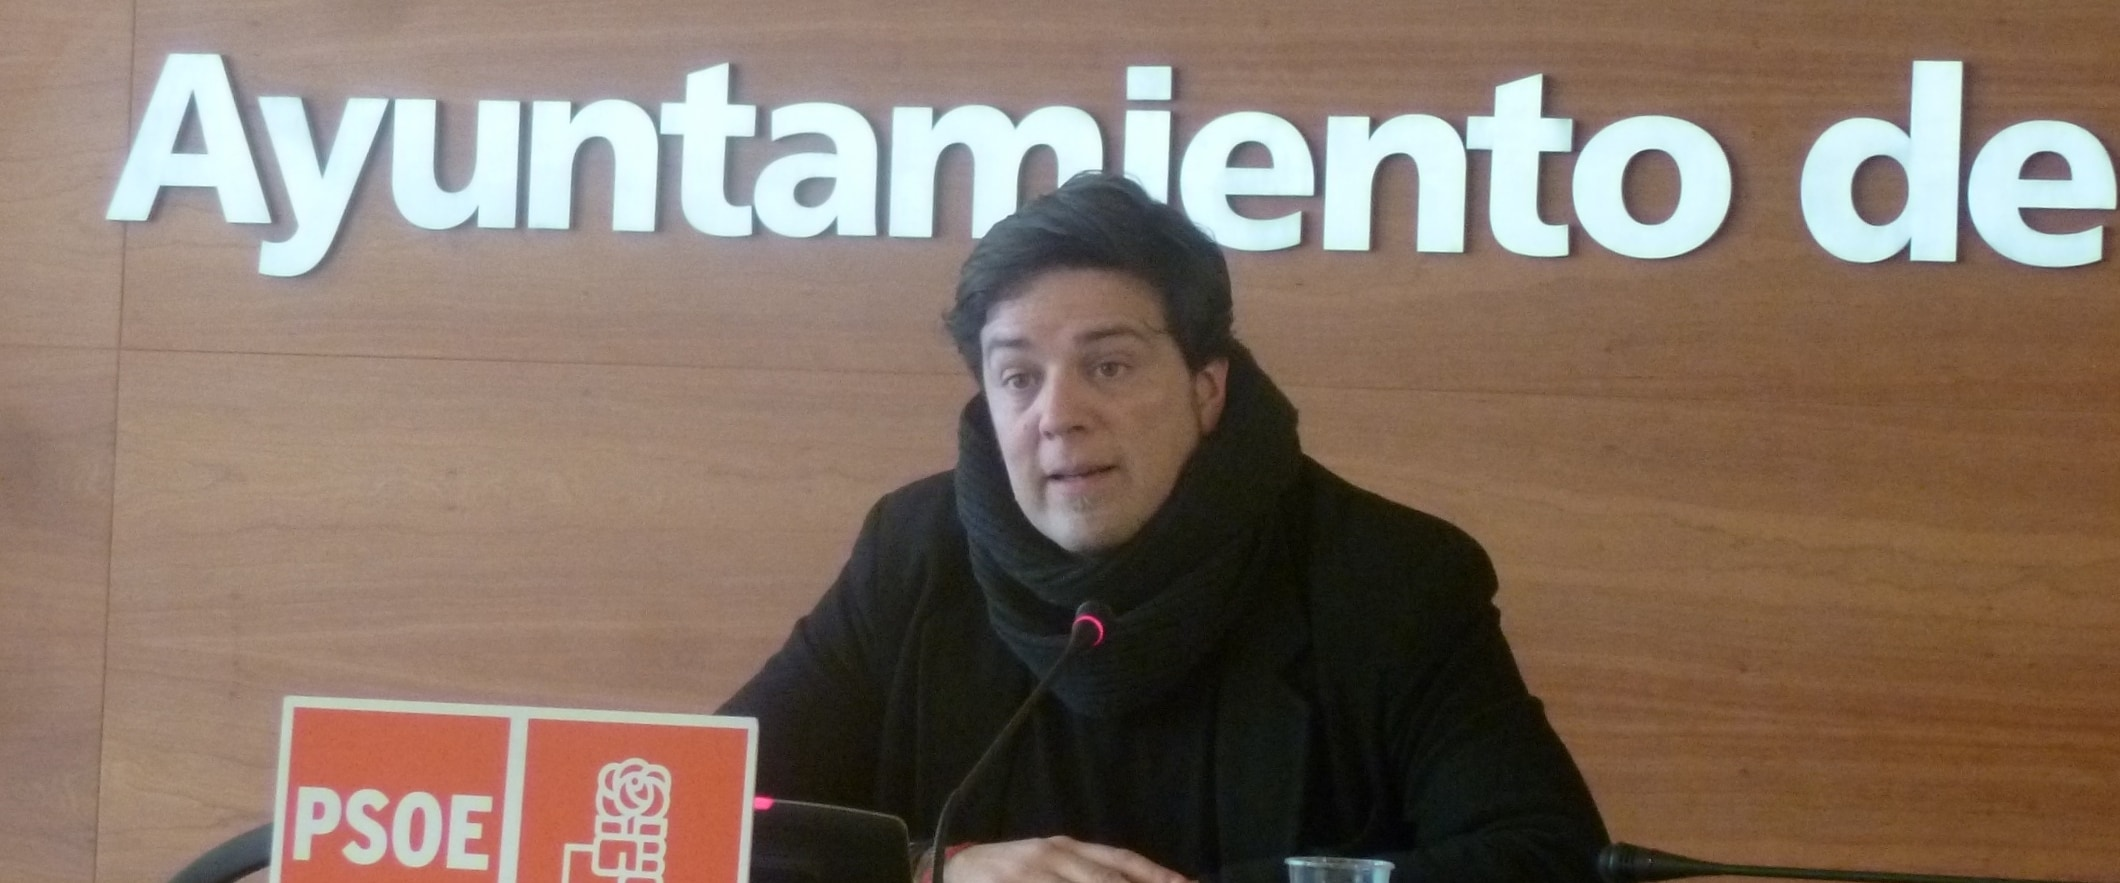 8 meses para reanudar los trámites de la \'Smart City\' | Rioja2.com